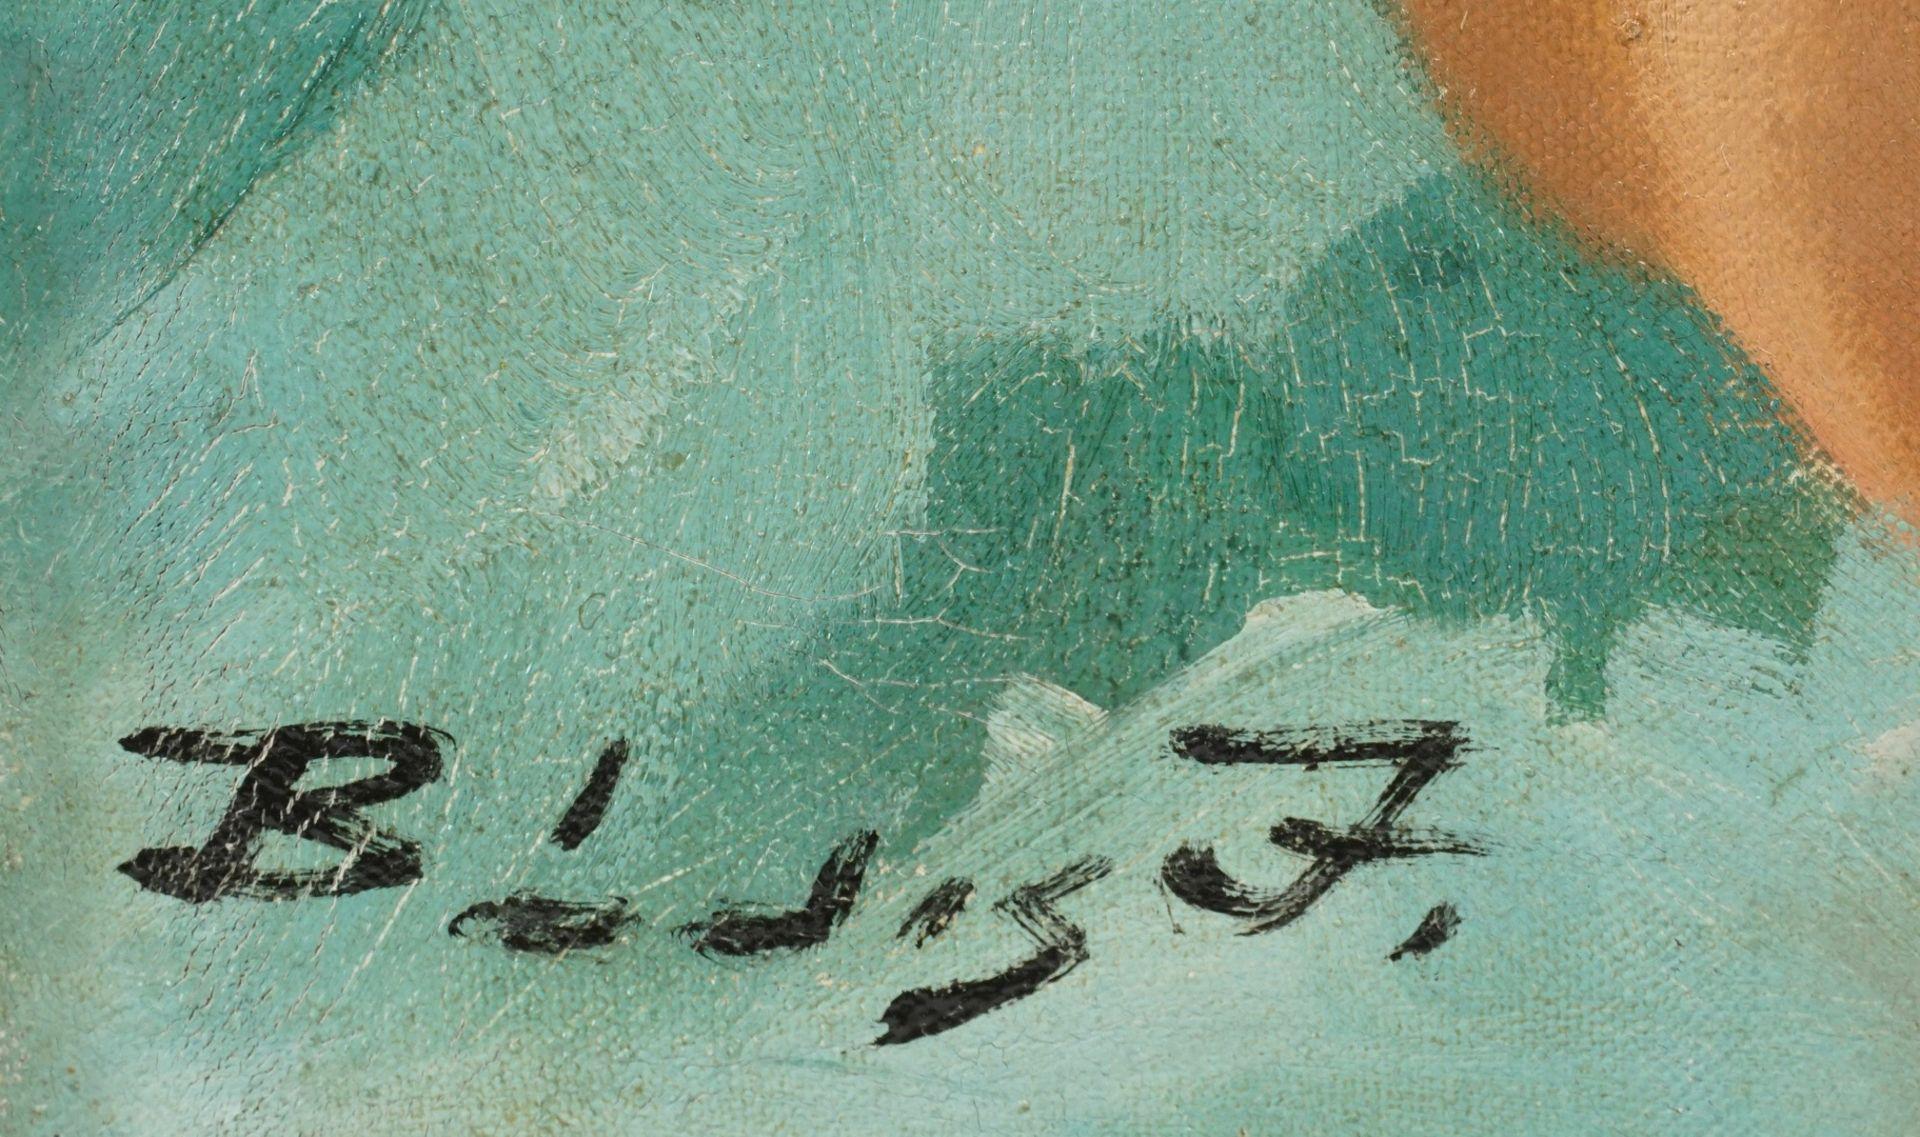 Josef Bódis, Pin-up Akt mit Regenbogenfahne - Bild 4 aus 4